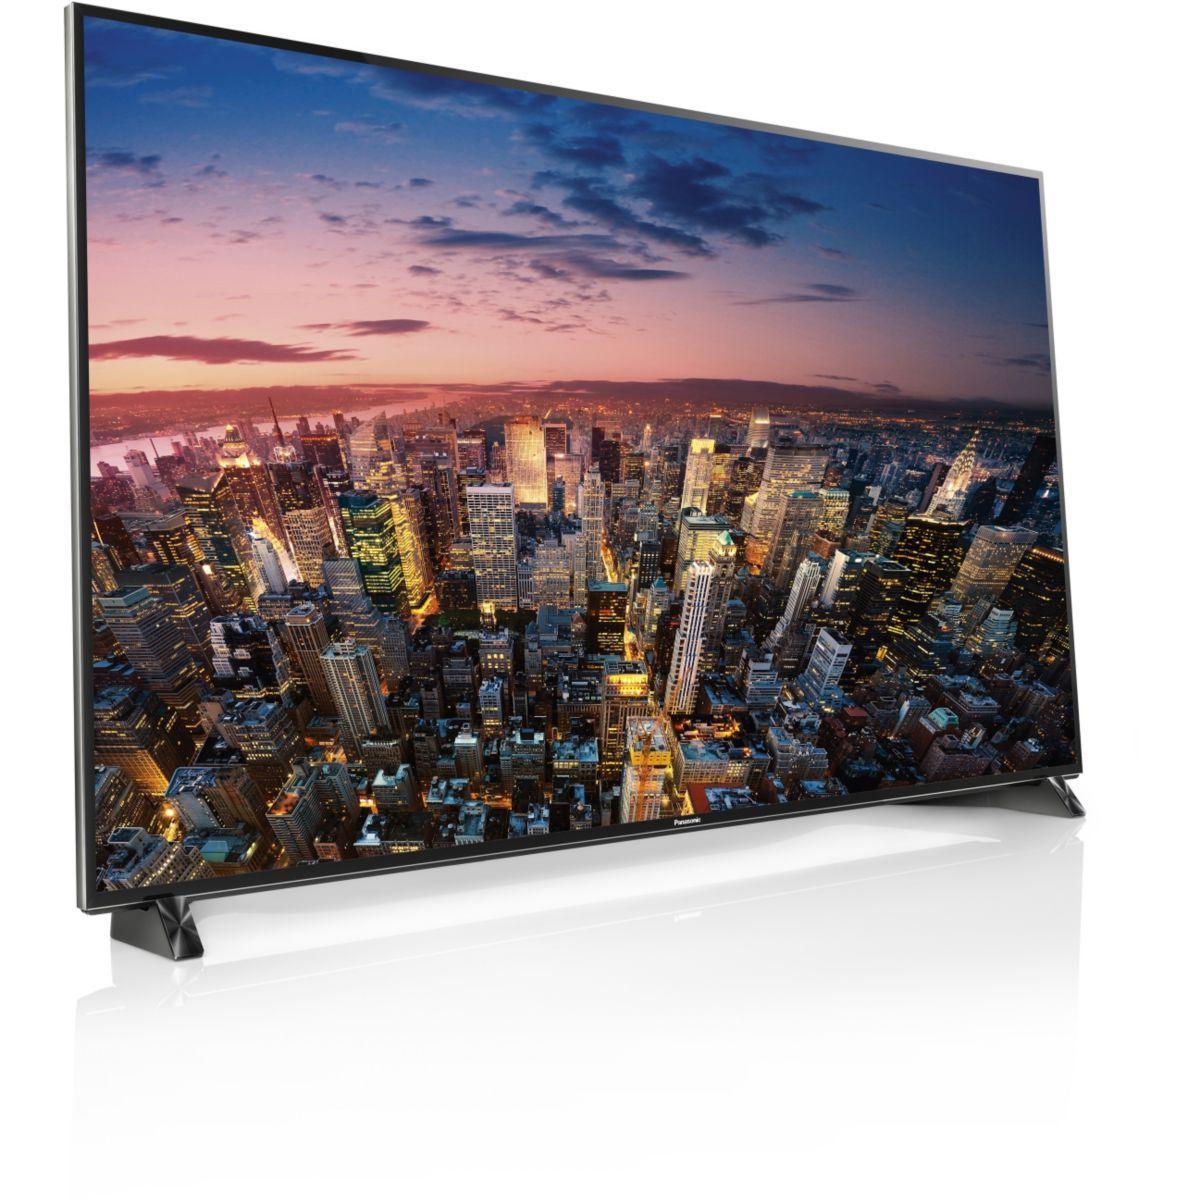 TV PANASONIC TX-58DX900E 4K 3000Hz BMR SMART TV